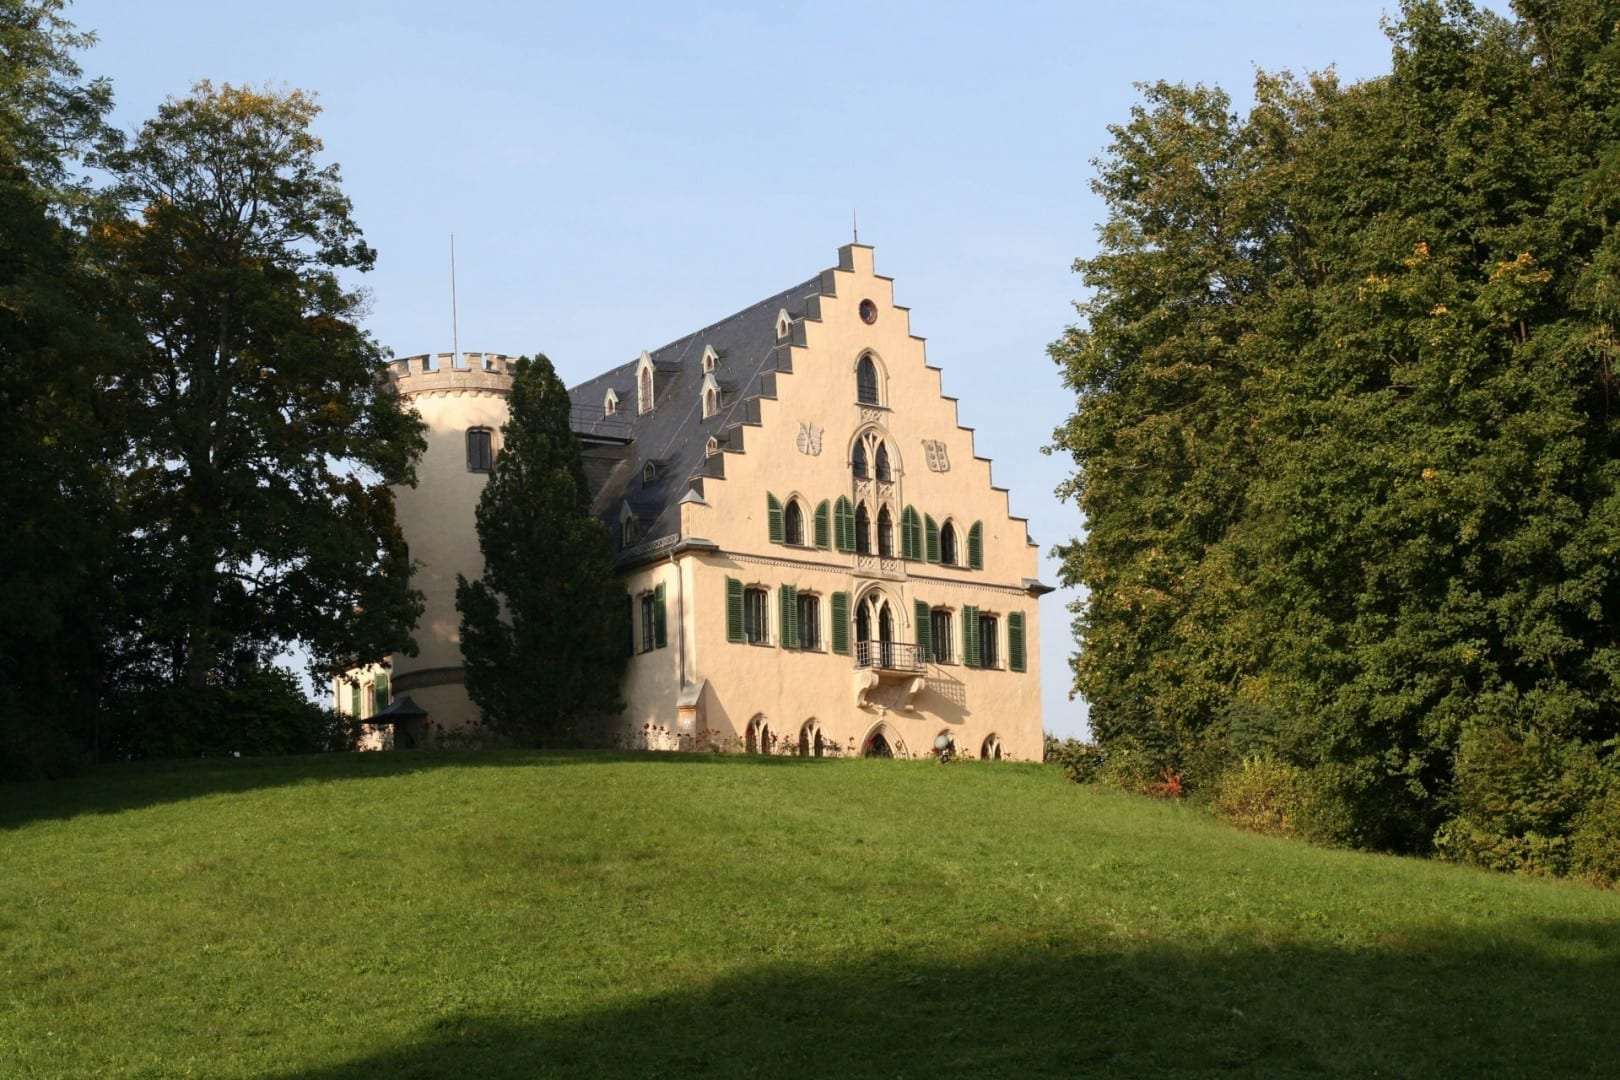 Castillo de Rosenau Coburgo Alemania